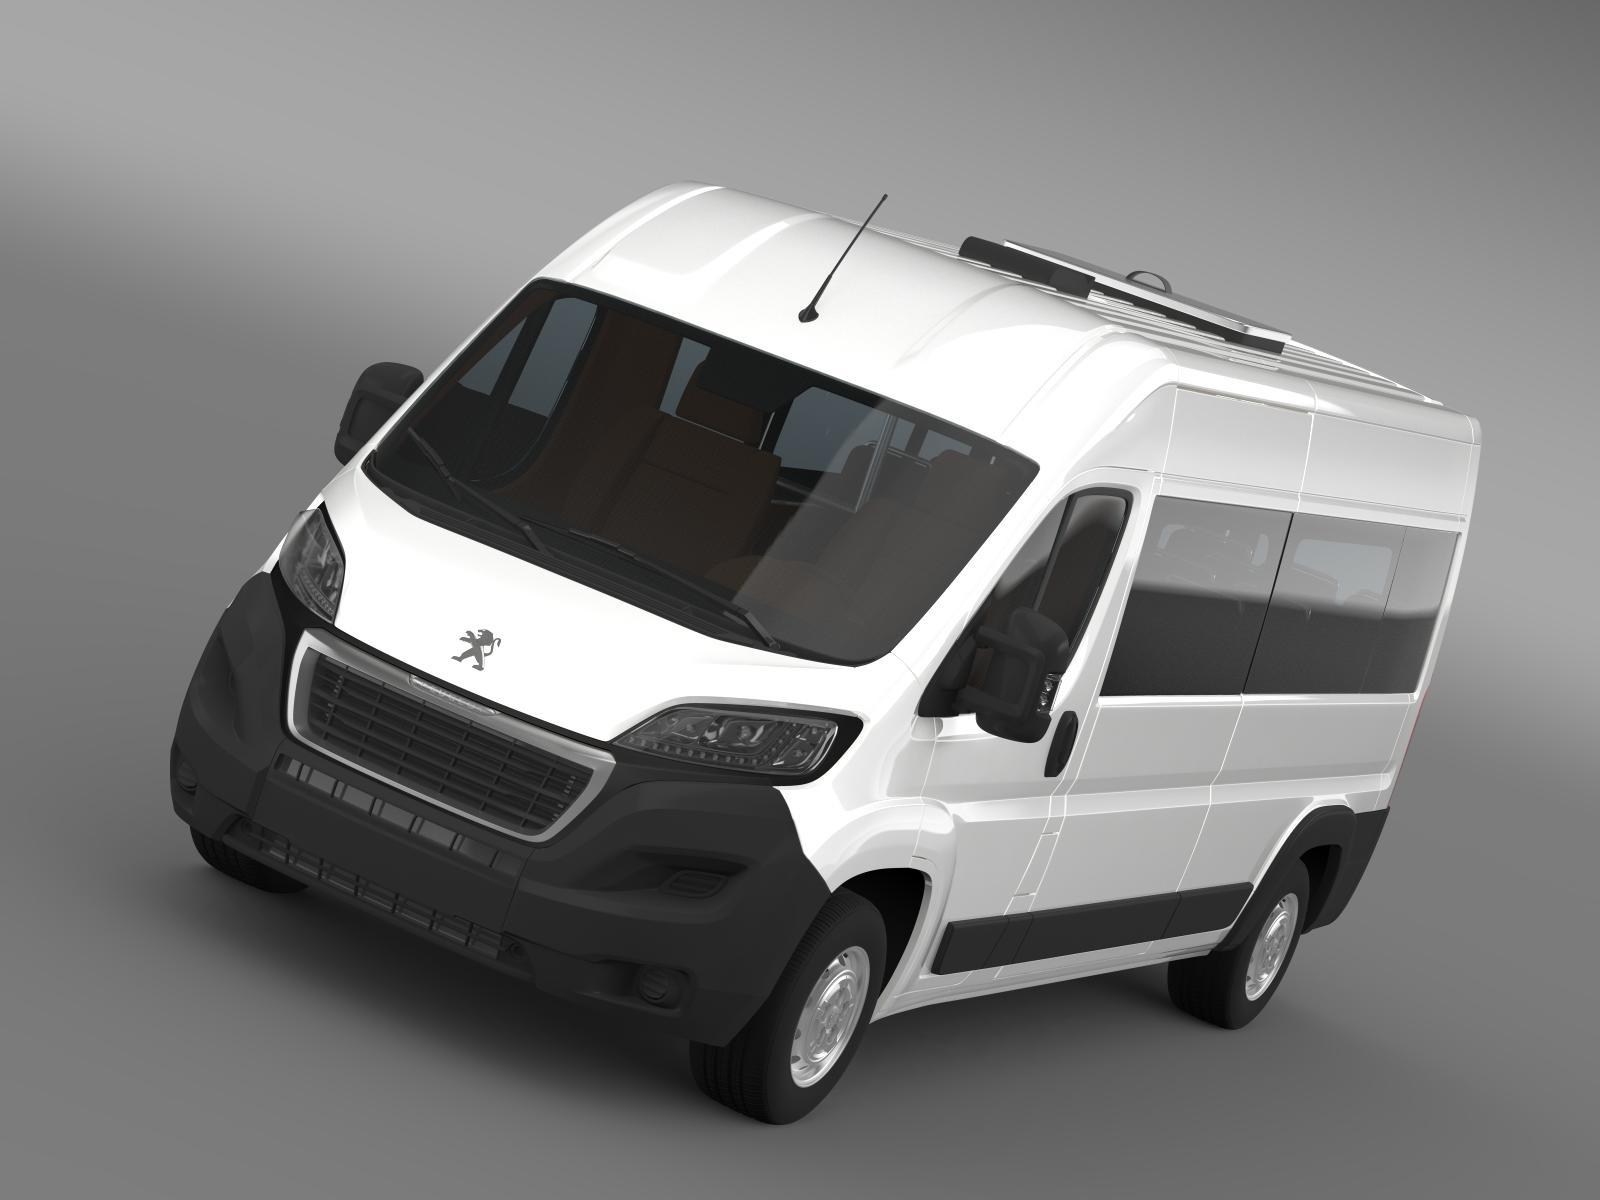 peugeot boxer minibus 2014 3d model 3ds max fbx c4d lwo ma mb hrc xsi obj 203197